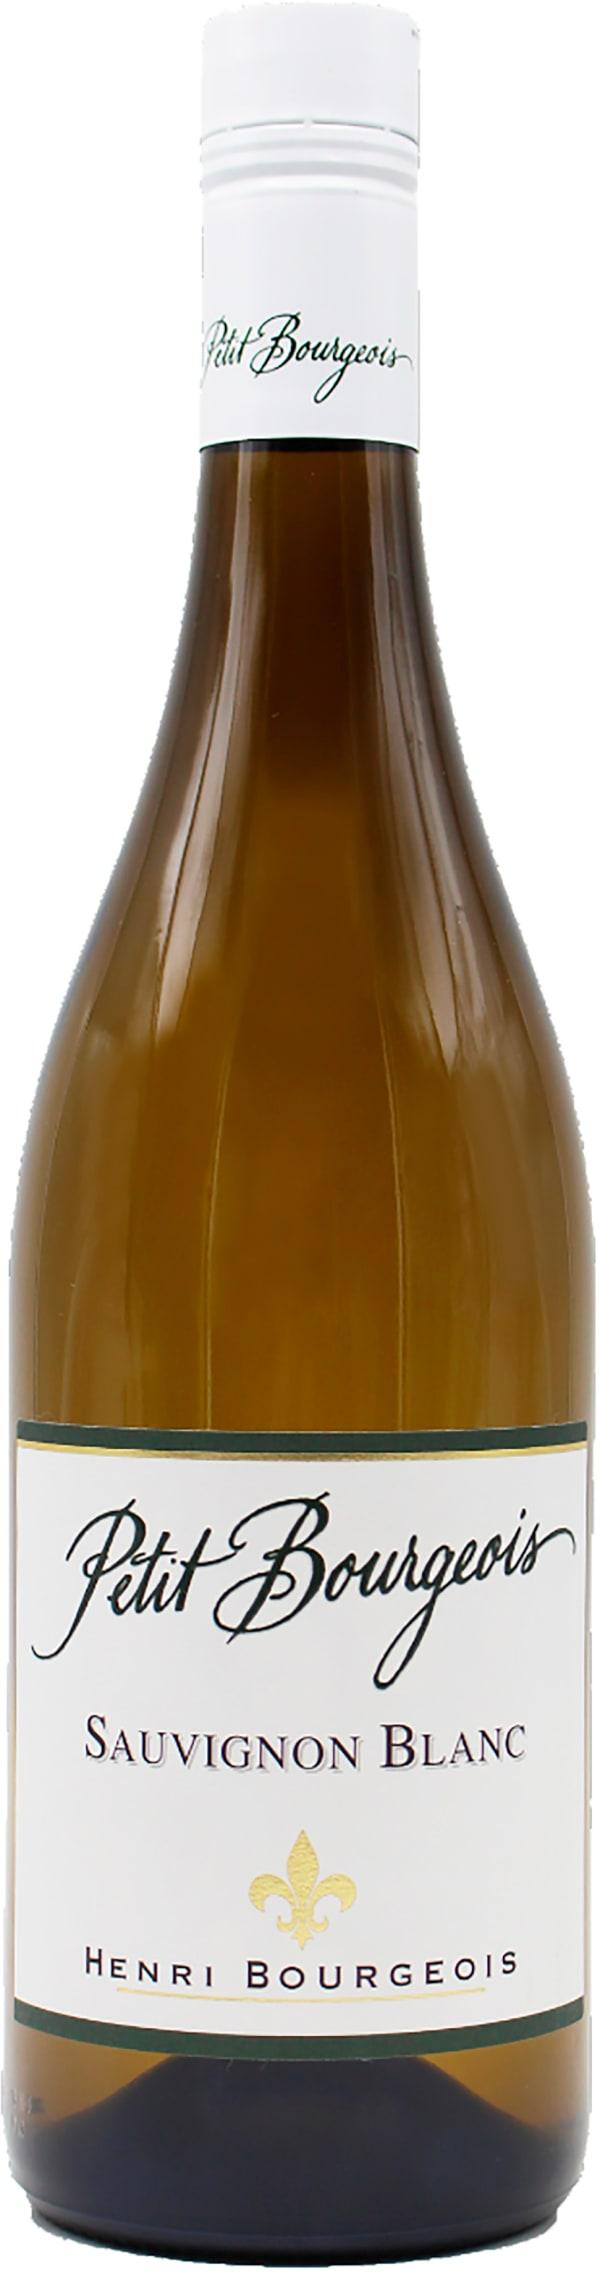 Petit Bourgeois Sauvignon Blanc 2020